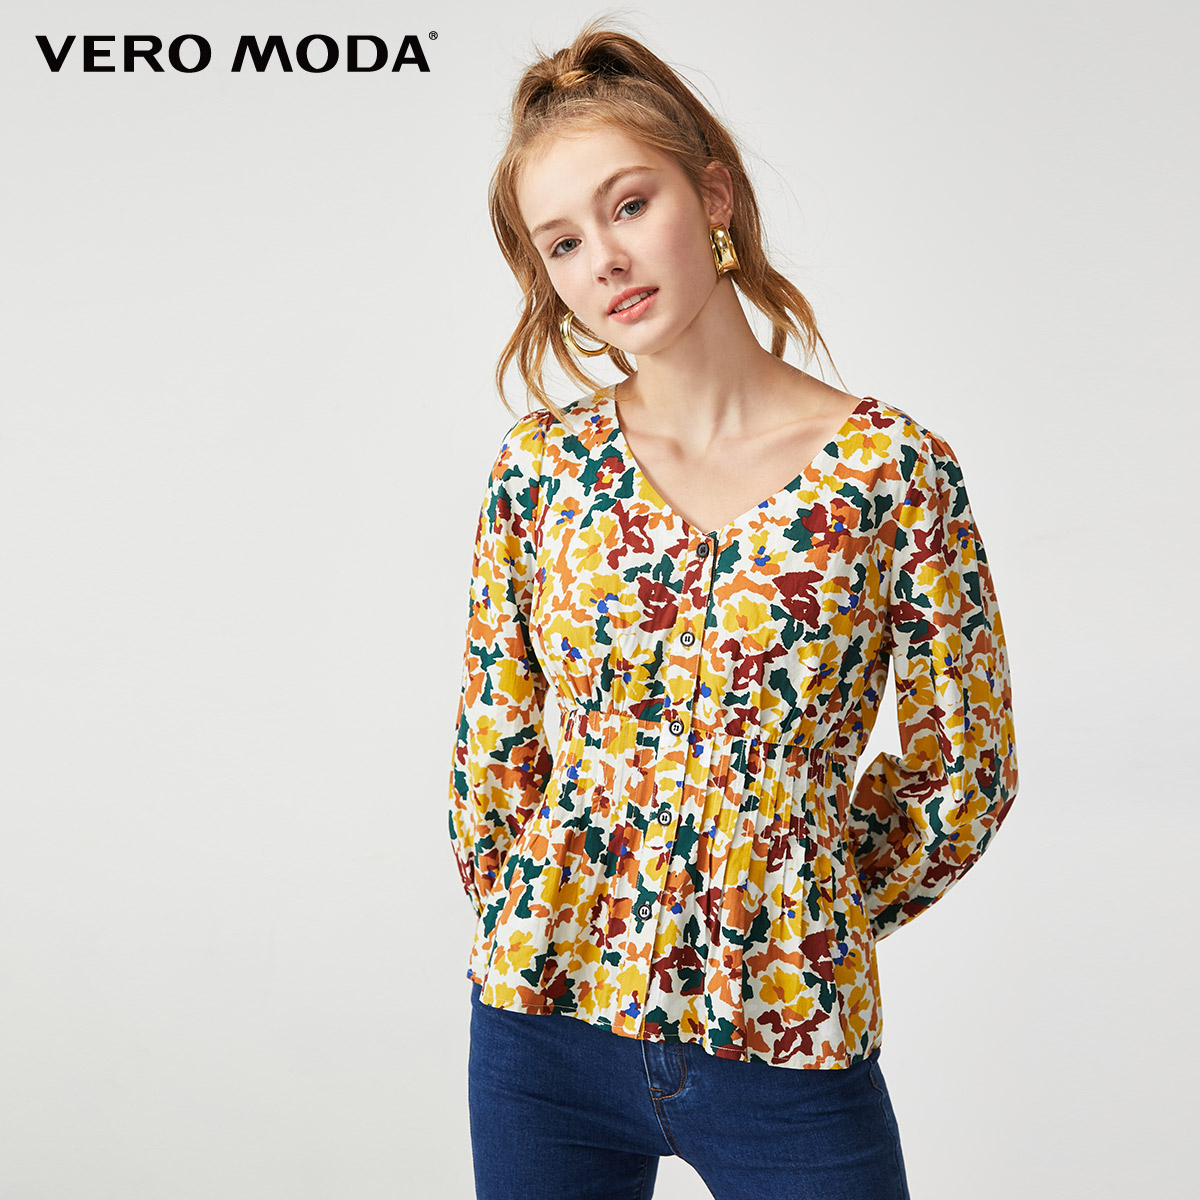 Vero Moda Women's Prairie Chic V-neckline 3/4 Sleeves Elasticized Waist Blouse | 319331590